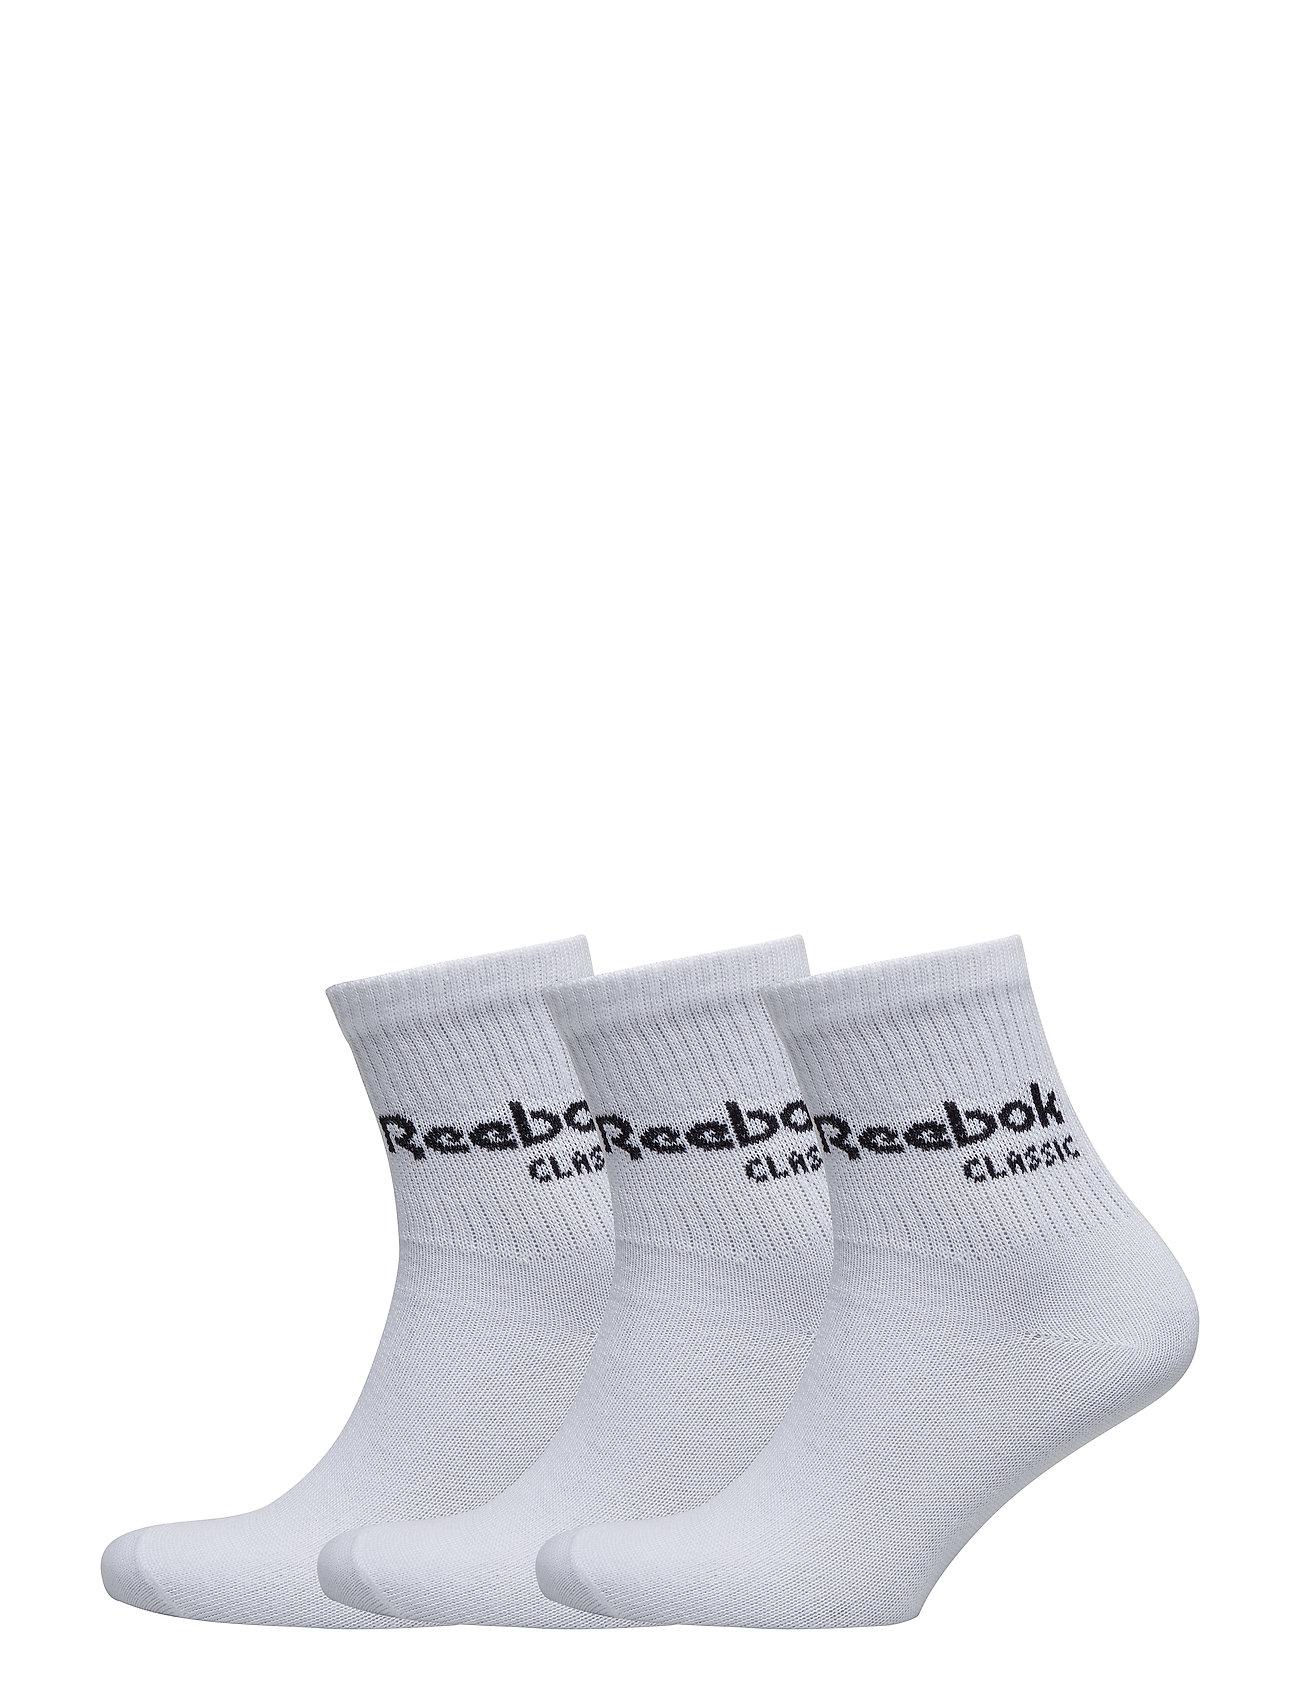 Reebok Classics CL CORE CREW SOCK 3P - WHITE/WHITE/WHITE